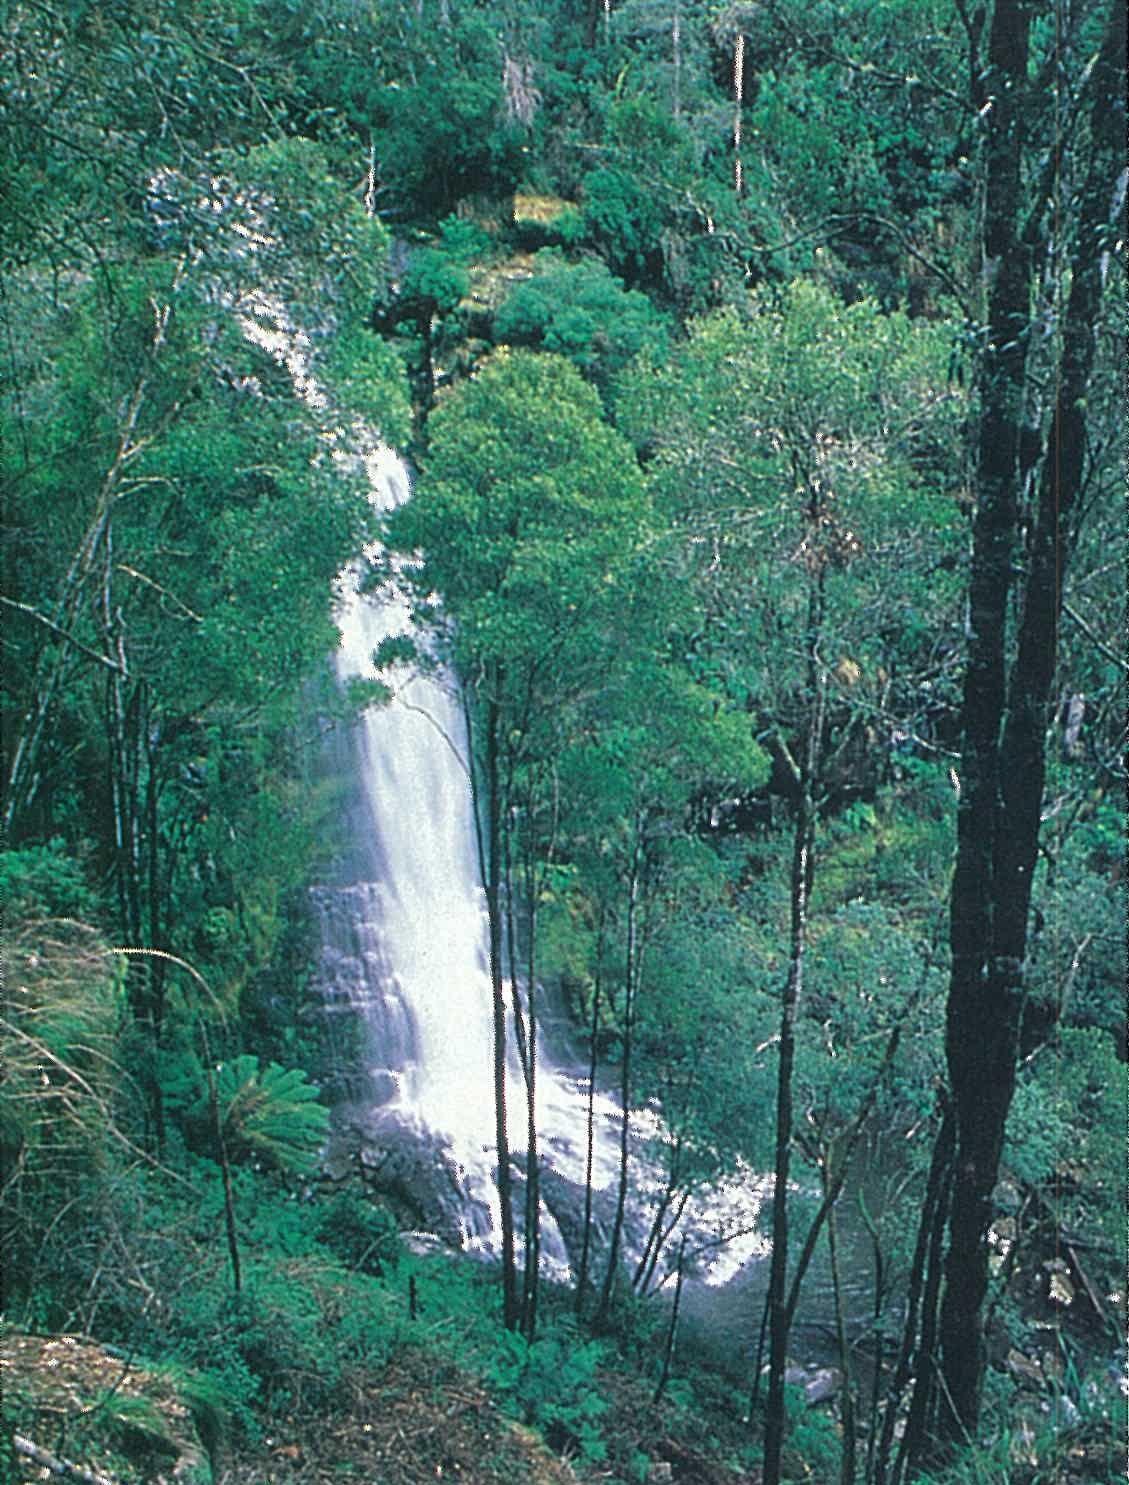 Otway Range; wet sclerophyl forest. Shrub stratum; Acacia melanoxylon, A. dealbata, Dicksonia antarctica, Phebalium squameum and Prostanthera lasianthos. Eucalyptus regnans (not pictured) forms canopy of surrounding forest. Erskine Falls, near Lorne.